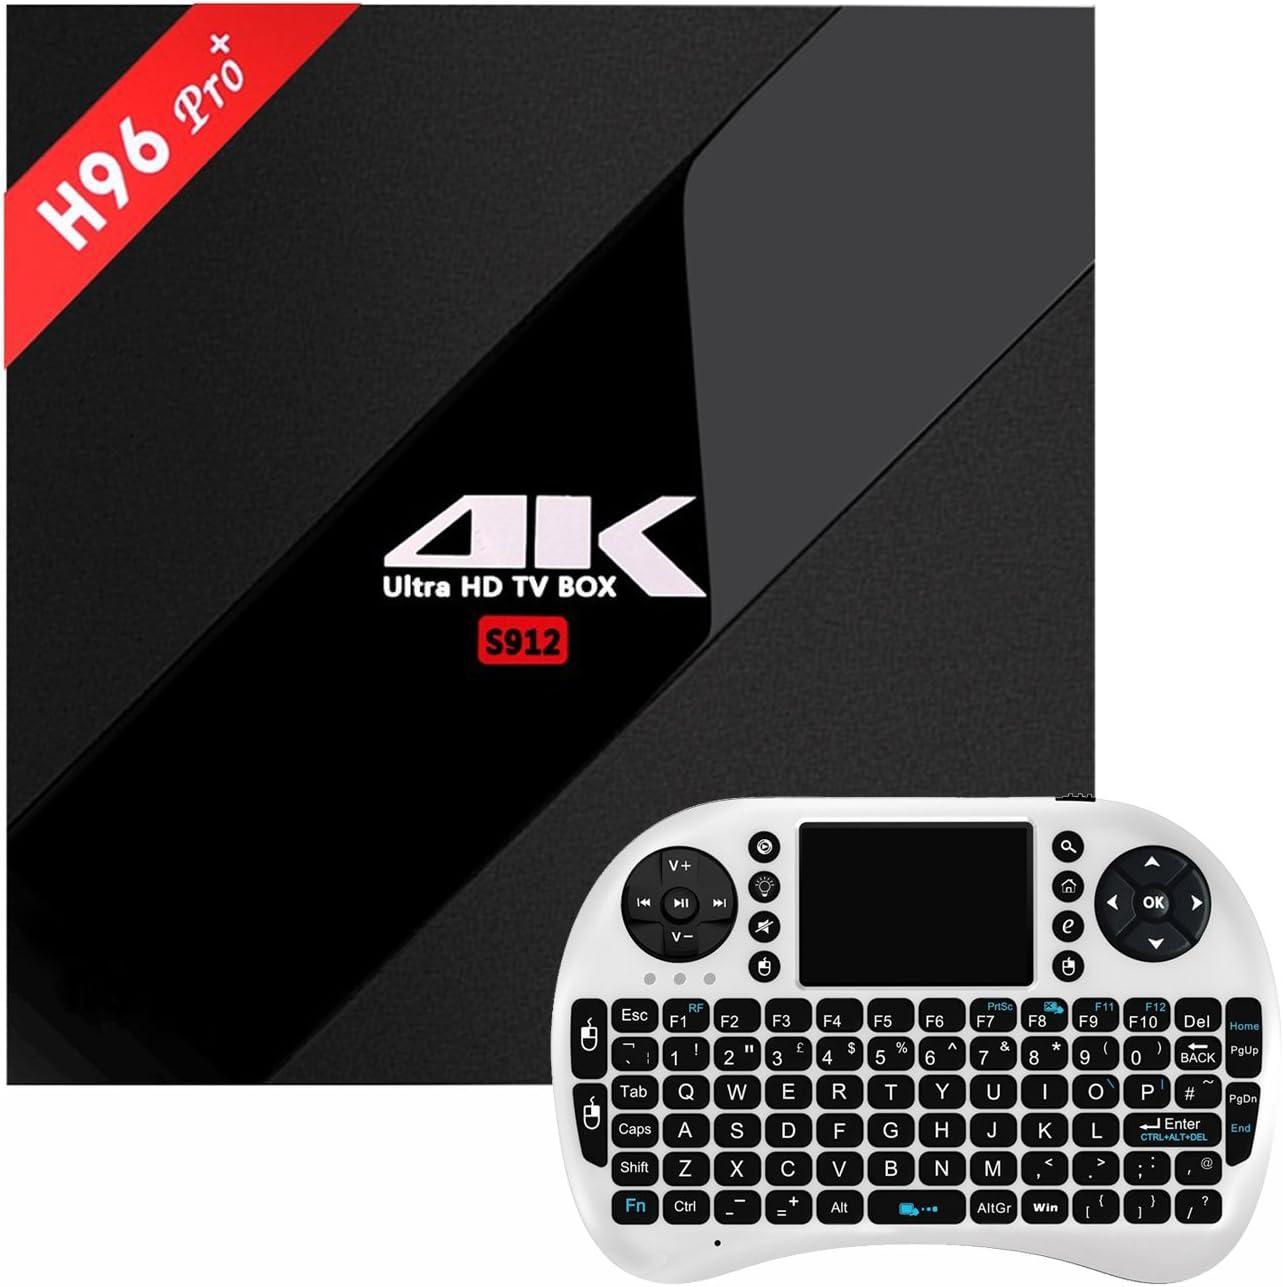 3GB + 32GB H96 Pro+],Ruiwin TV Caja Android 6.0 Reproductor Amlogic S912 64bit Octa-core 4K Smart TV BOX Bluetooth 4.1 Televisión Caja Dual Band WIFI 1000M LAN (H96 pro plus 3G +32G